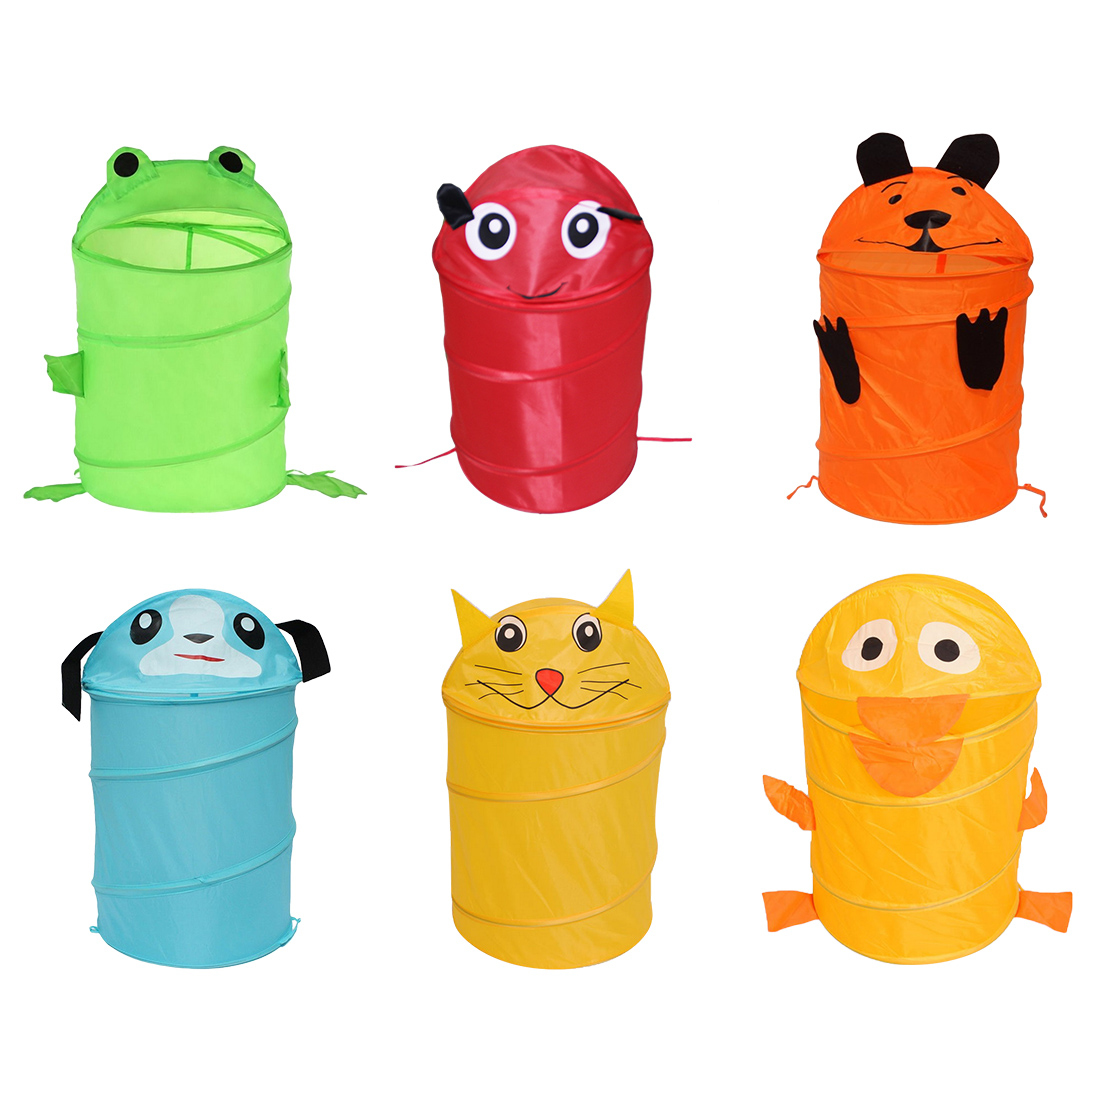 Cute Animal Collapsible Toy Storage Organizer Folding: 6 Style Cute Animal Big Capacity Waterproof Storage Bucket